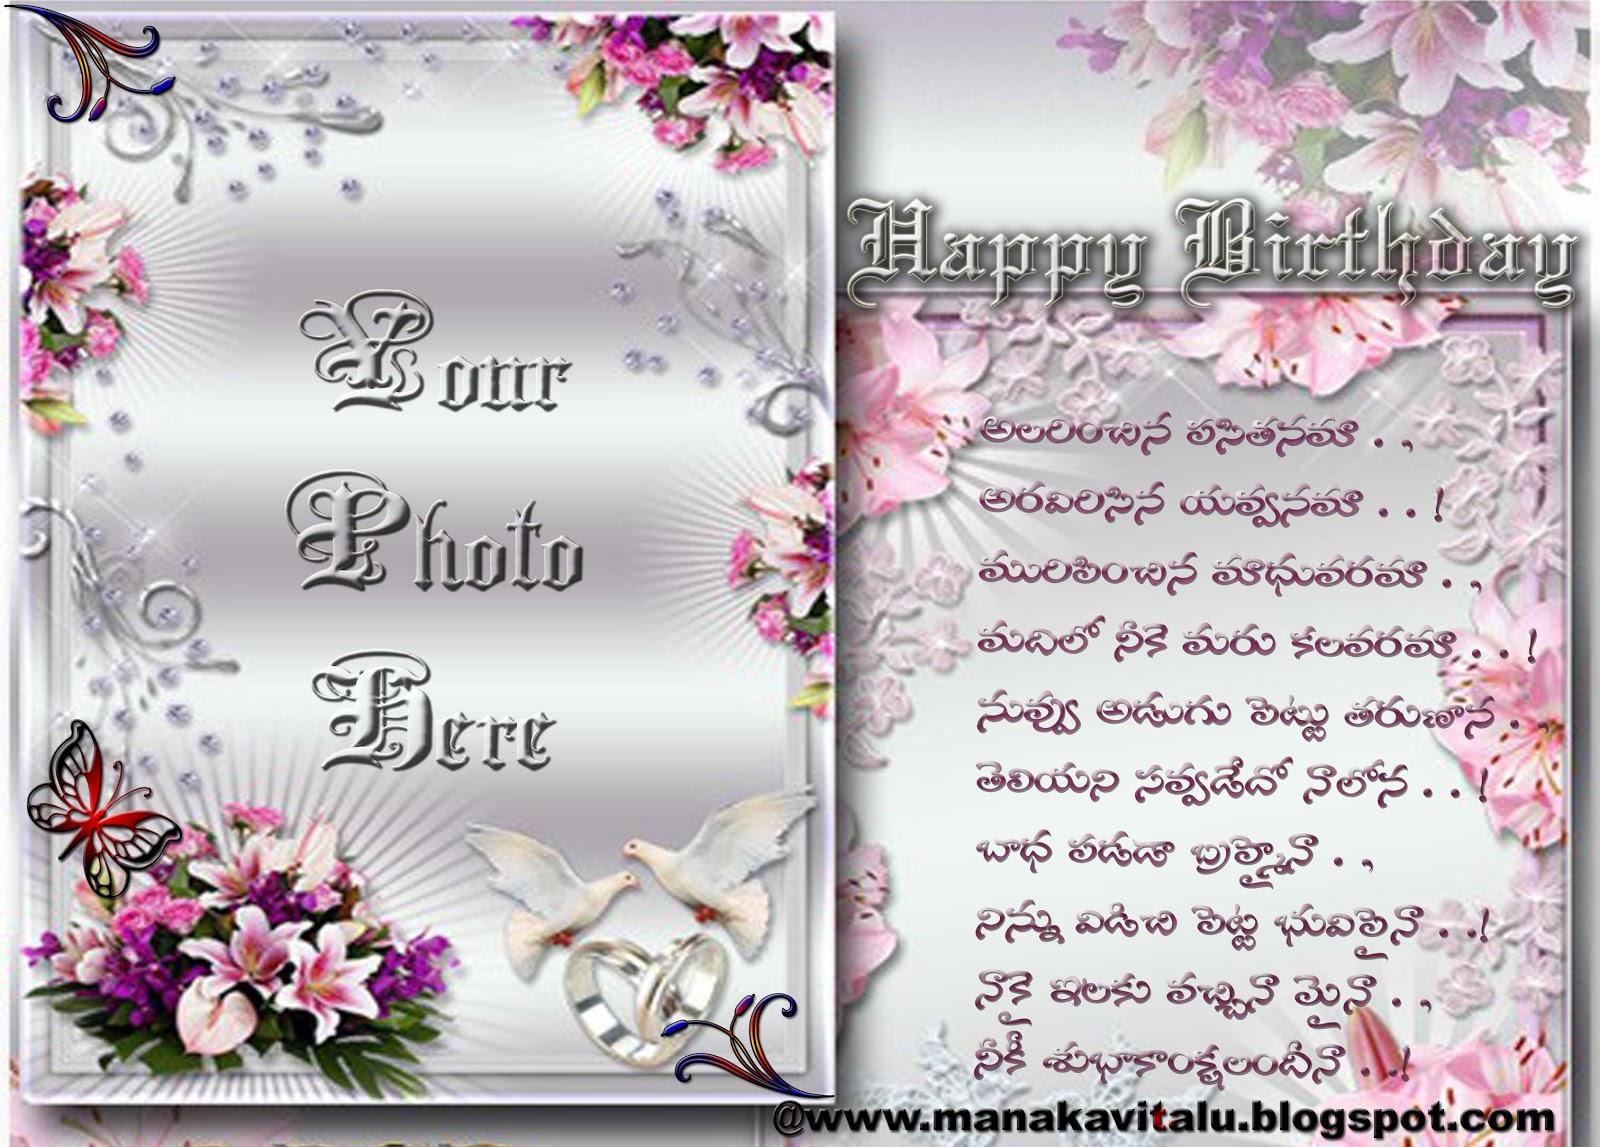 How to write happy birthday in telugu